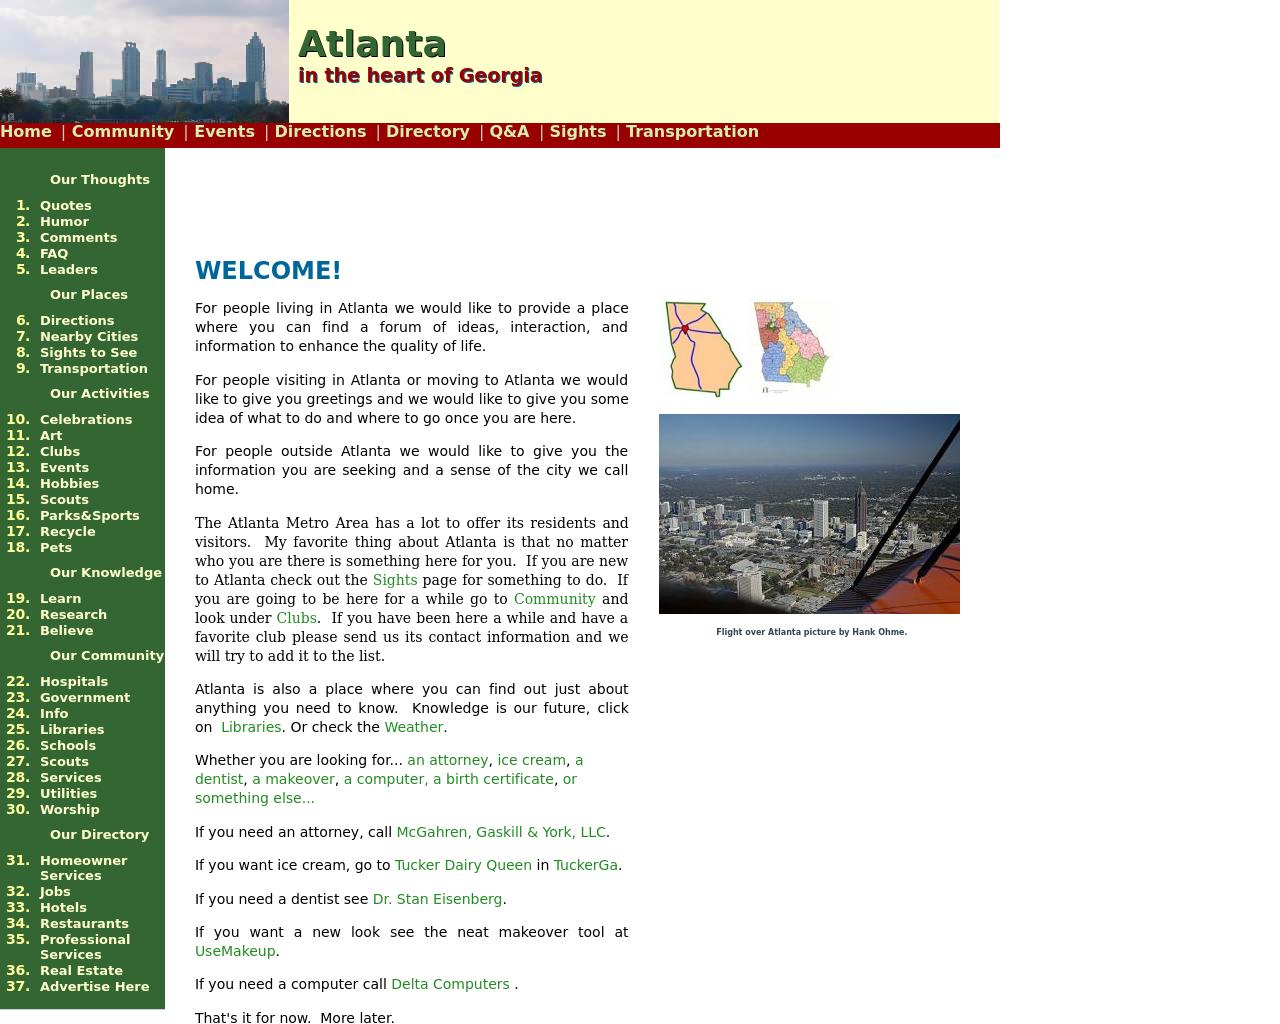 Atlanta-In-The-Heart-Of-Georgia-Advertising-Reviews-Pricing